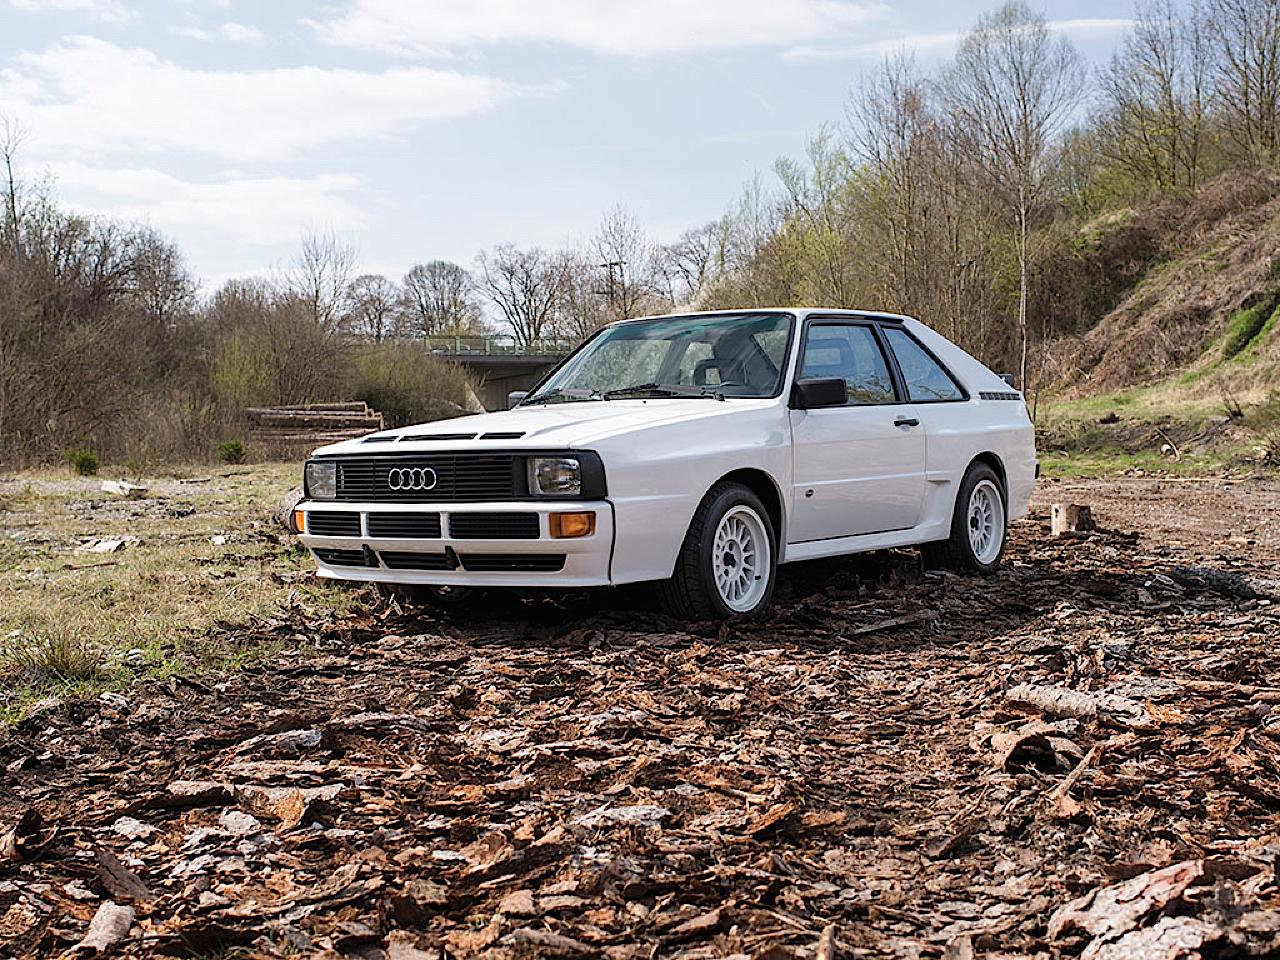 Audi Quattro Sport - Châssis court, turbo et muscu ! 2